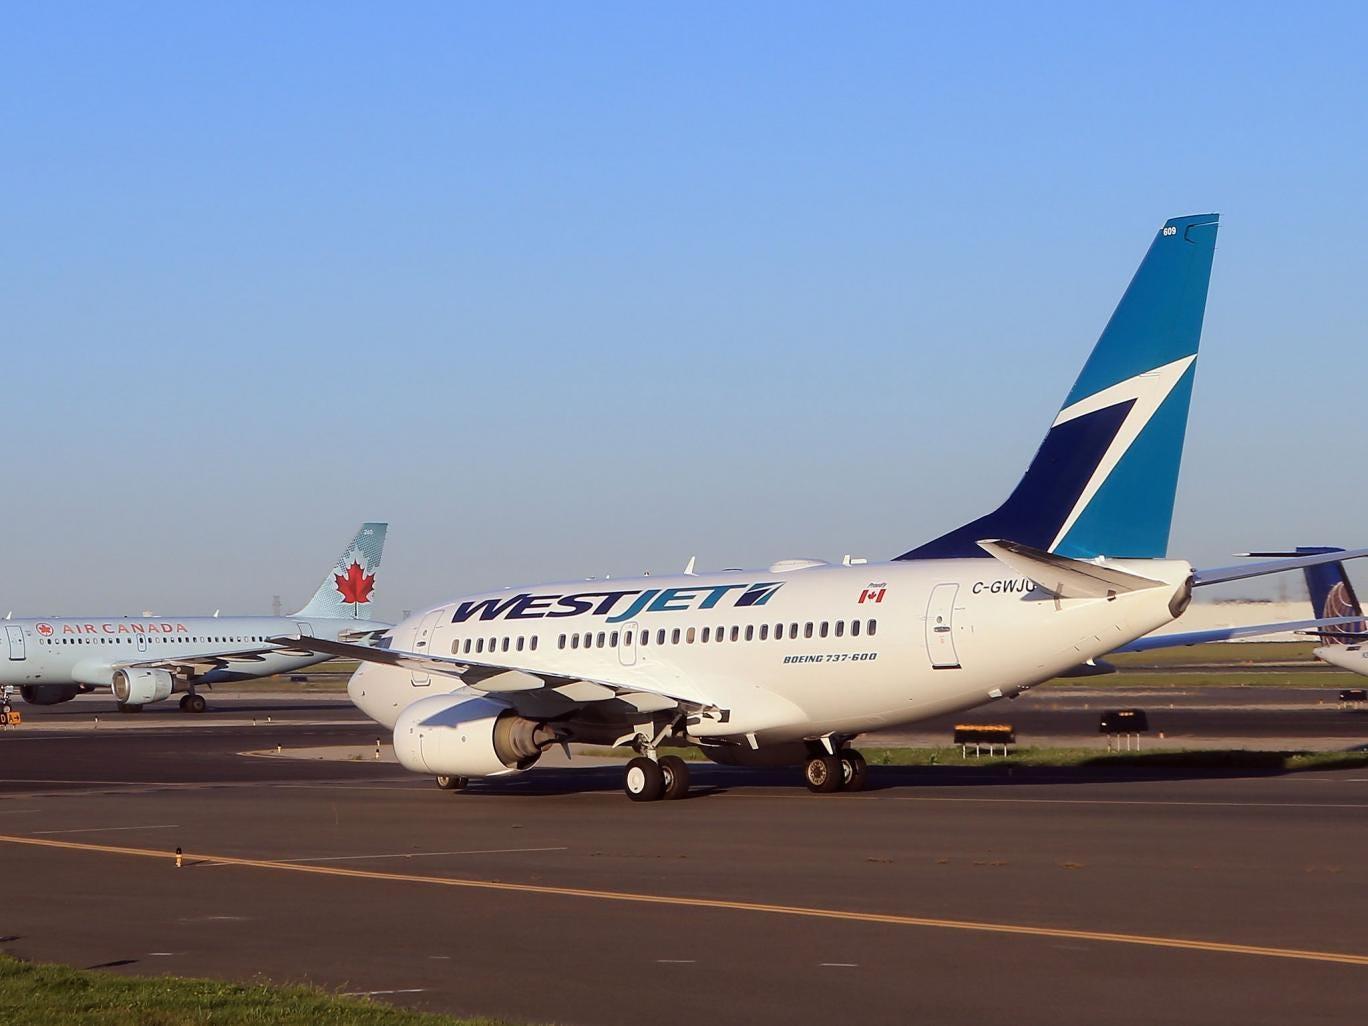 WestJet, based in Calgary, is extending its domestic network across the Atlantic to Ireland